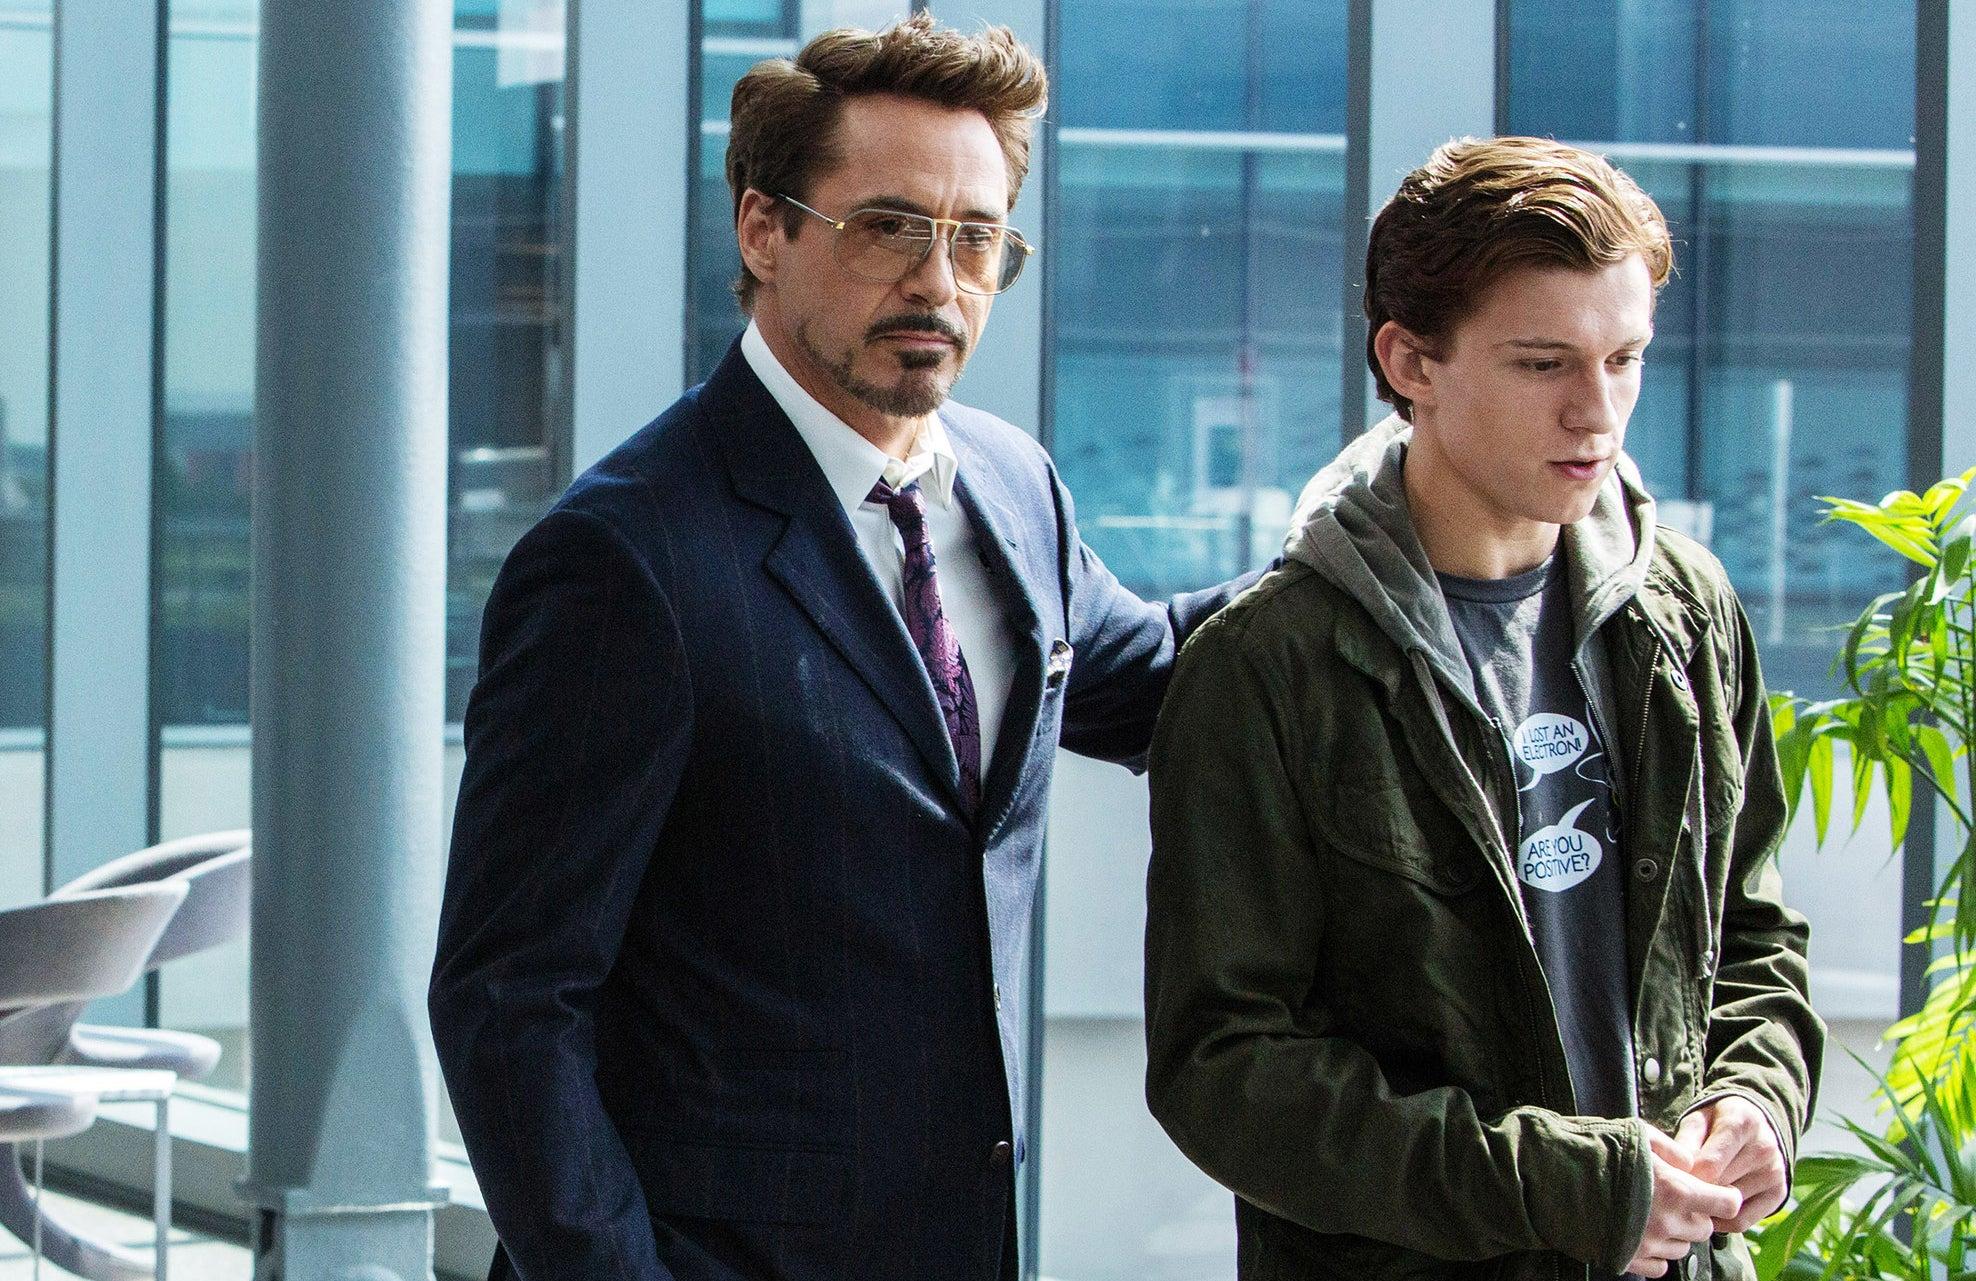 Robert Downey Jr. and Tom Holland